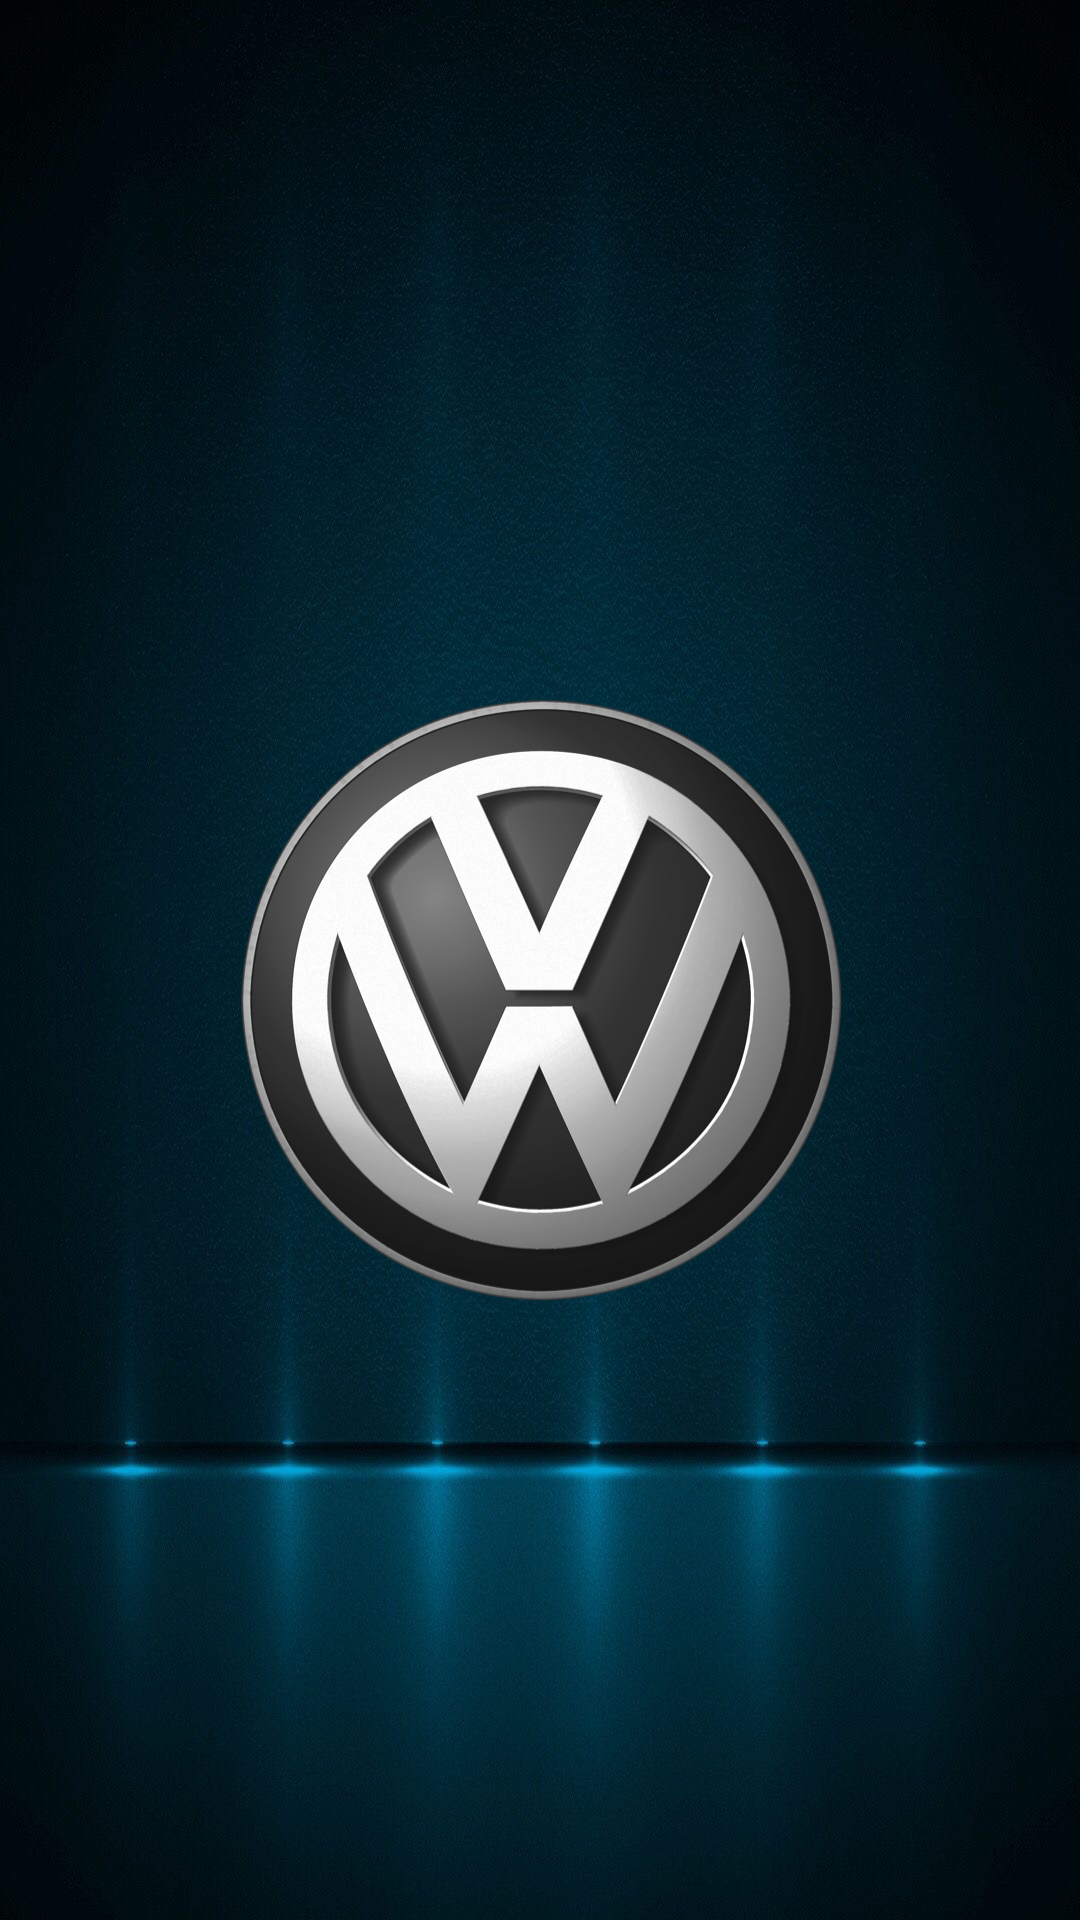 Pin By Captain Jd On Wallpapers Volkswagen Volkswagen Logo Backgrounds Phone Wallpapers